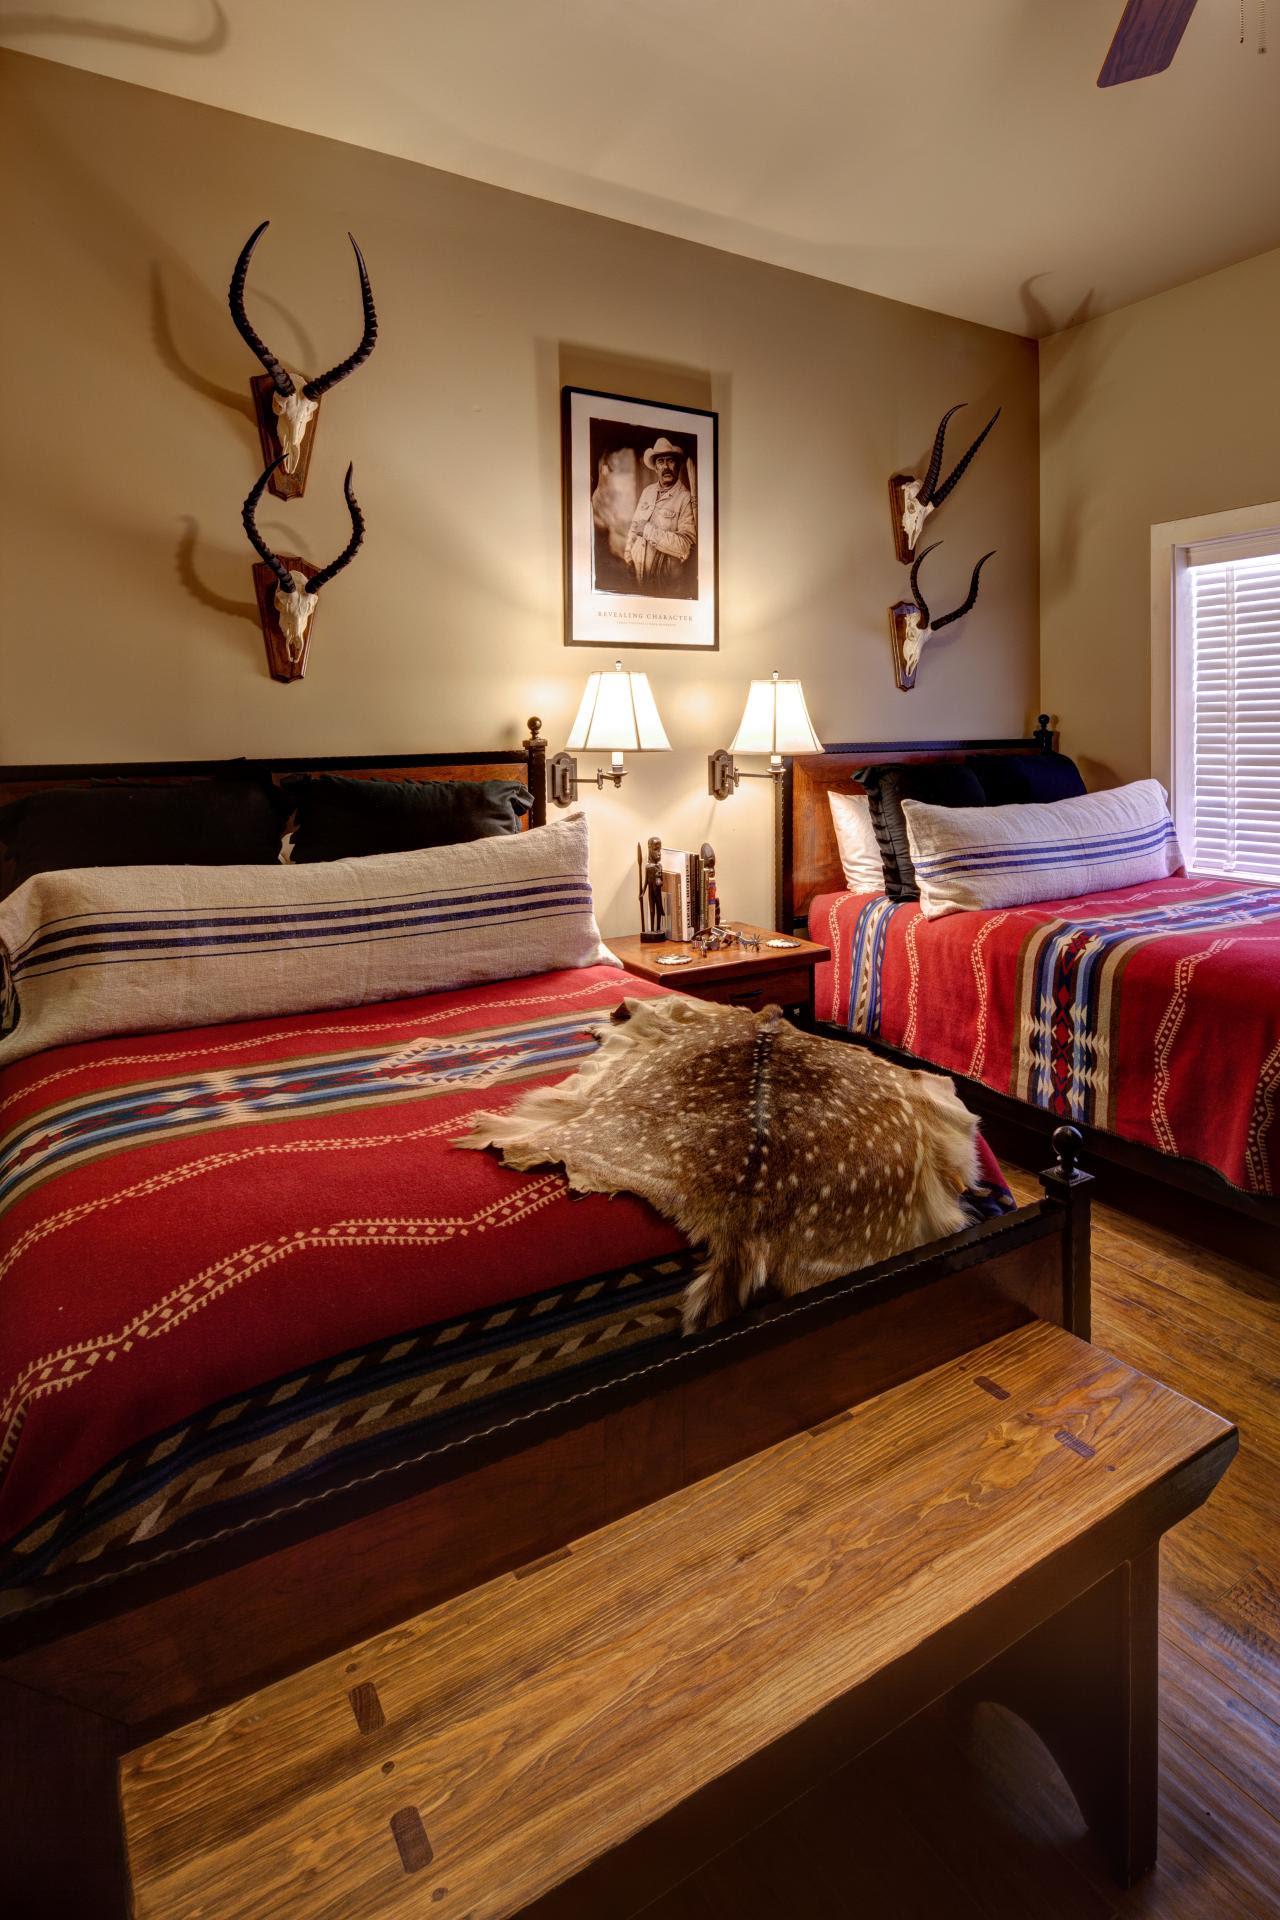 25 Southwestern Bedroom Design Ideas - Decoration Love